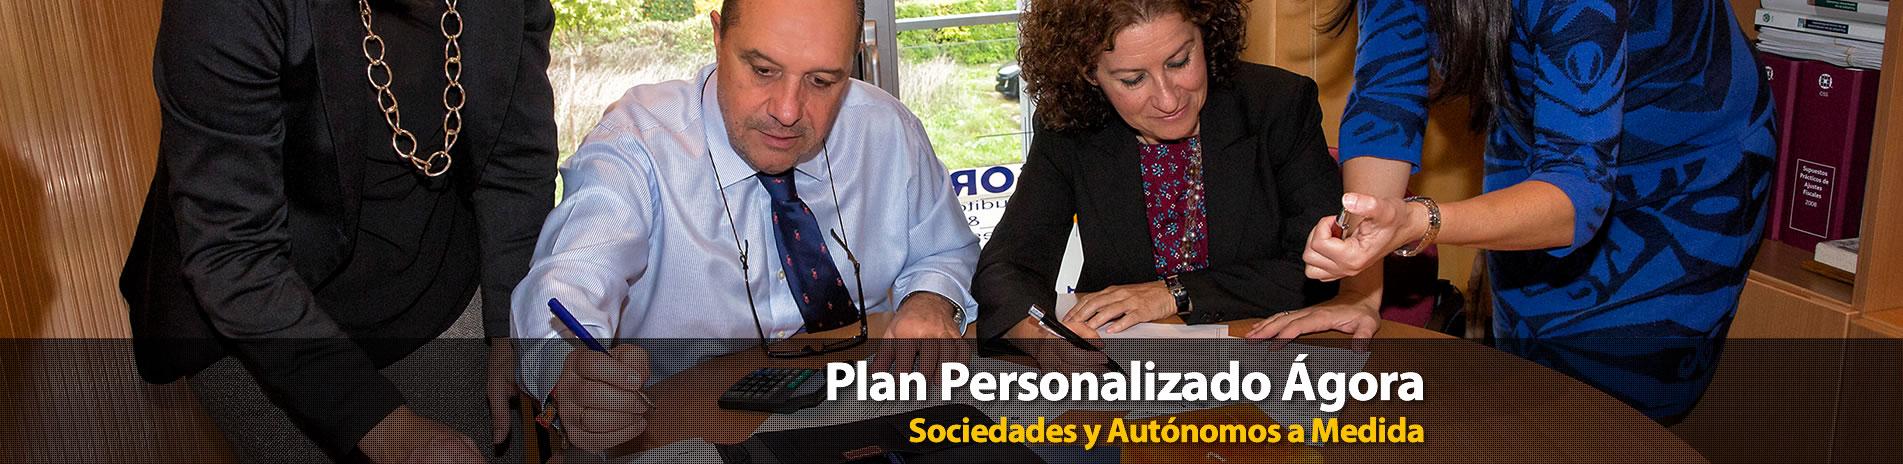 slide_plan_agora3